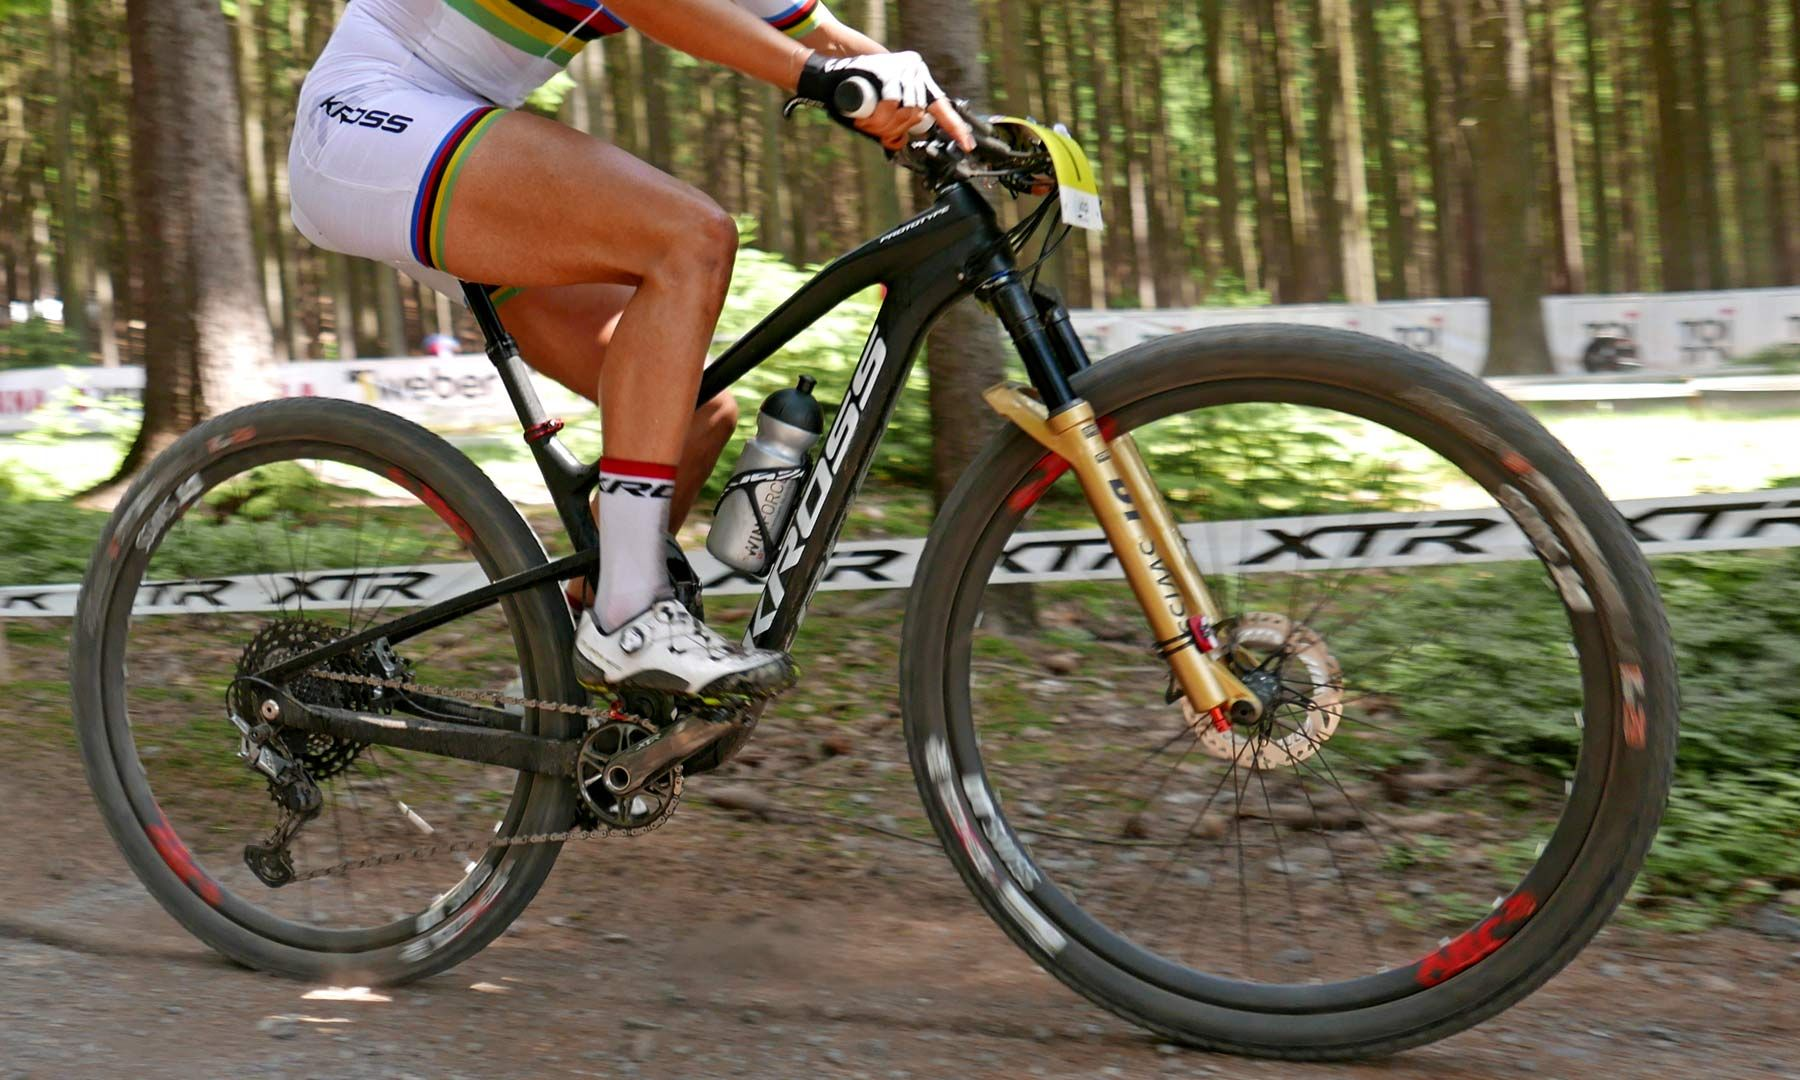 Prototype Kross Earth 100mm Carbon Xc Bike Of World Champ Jolanda Neff New Xtr Bike Neff Champs